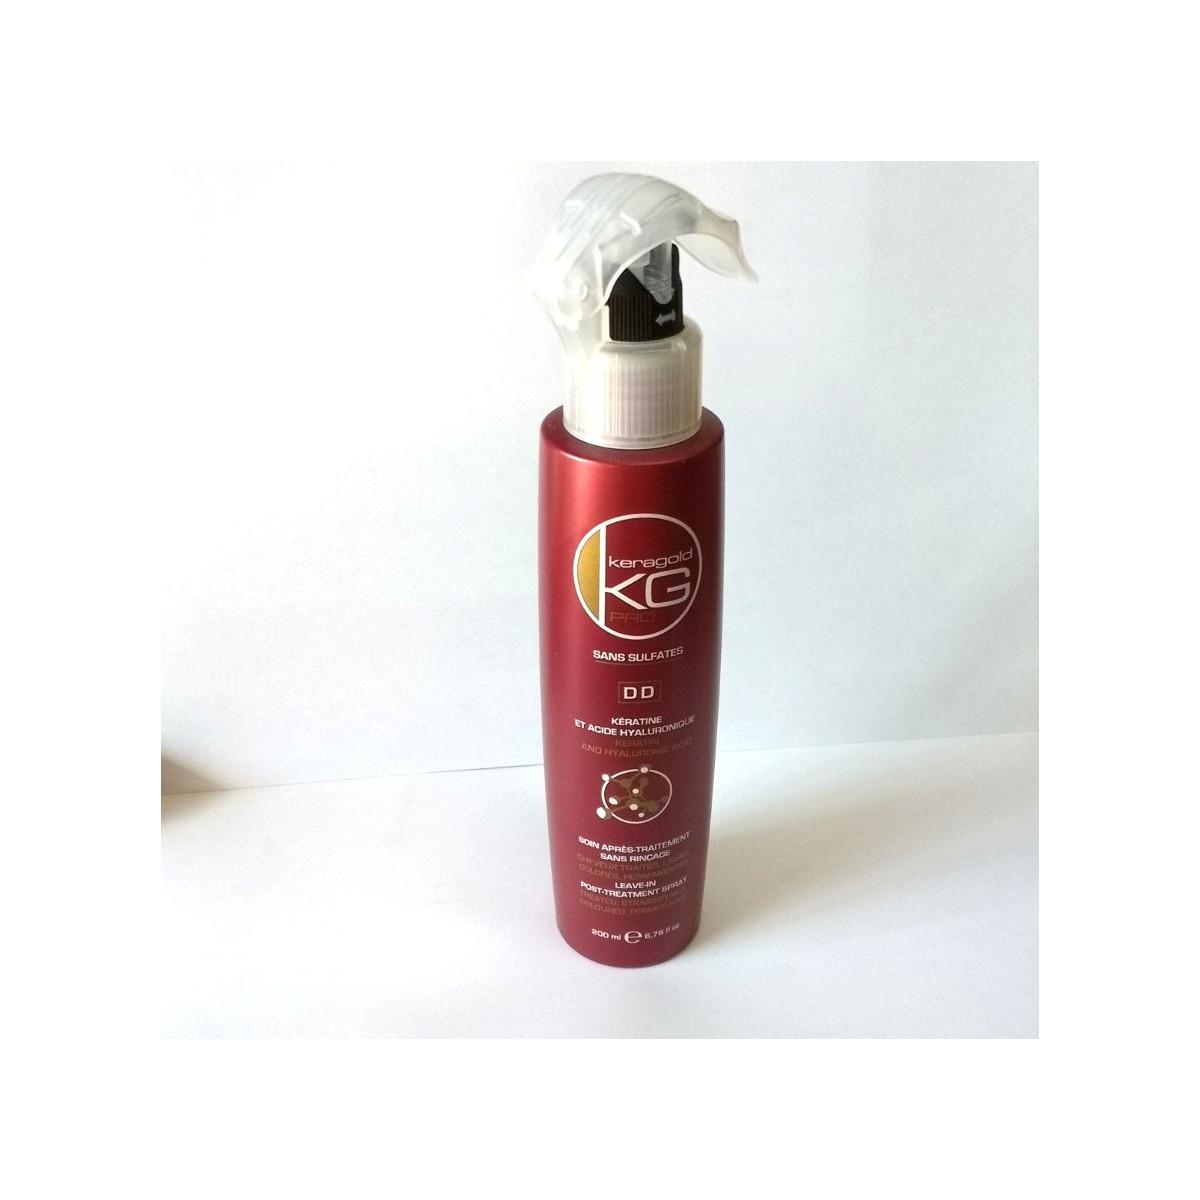 Soin kératine et acide hyaluronique DD - Keragold Pro 200ml